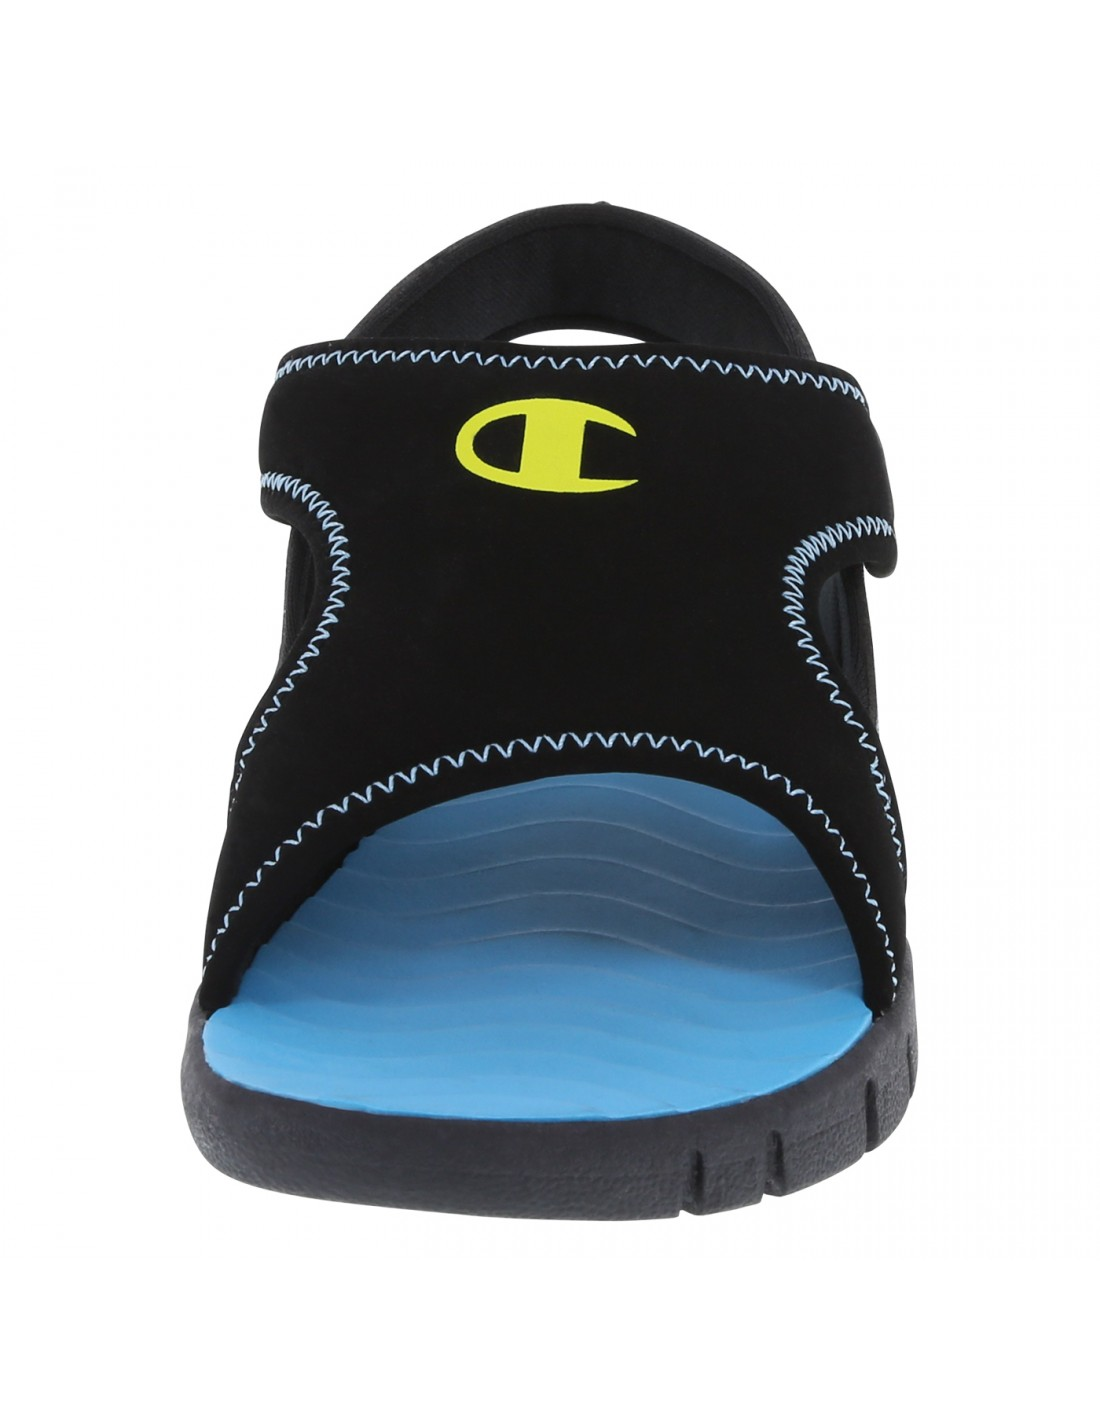 626e24d678a Boys  Toddler Splash Sandals. Next